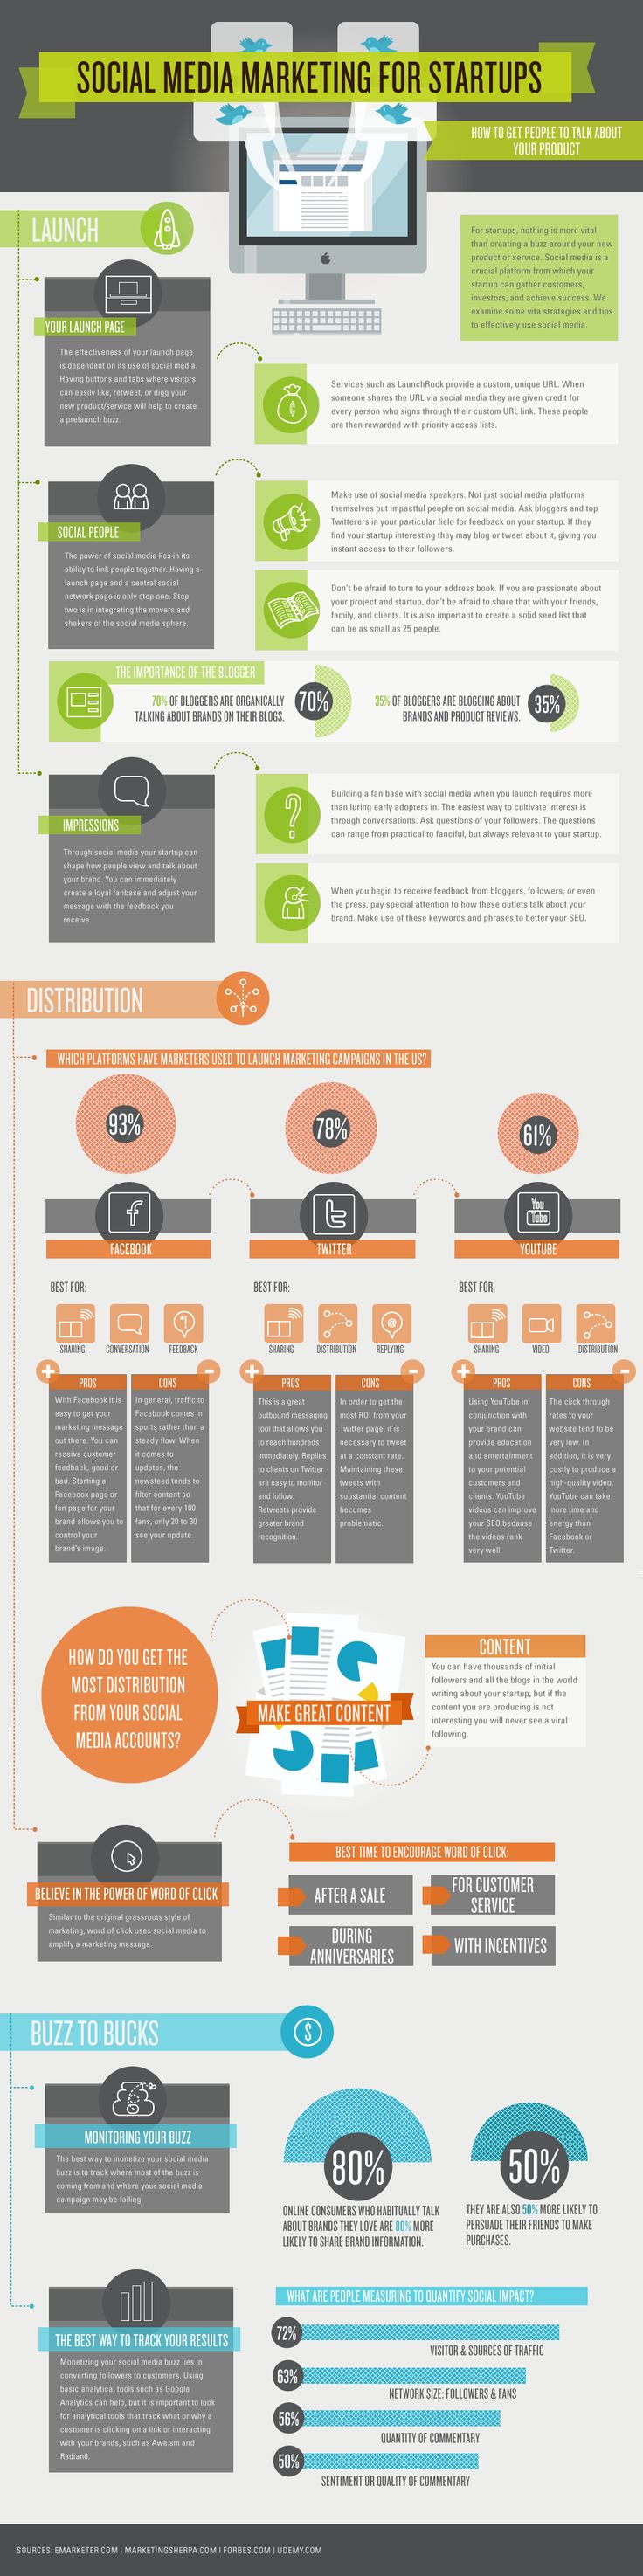 Social Media Marketing for Startups. #infographic #socialmedia #Facebook #Twitter #YouTube #marketing